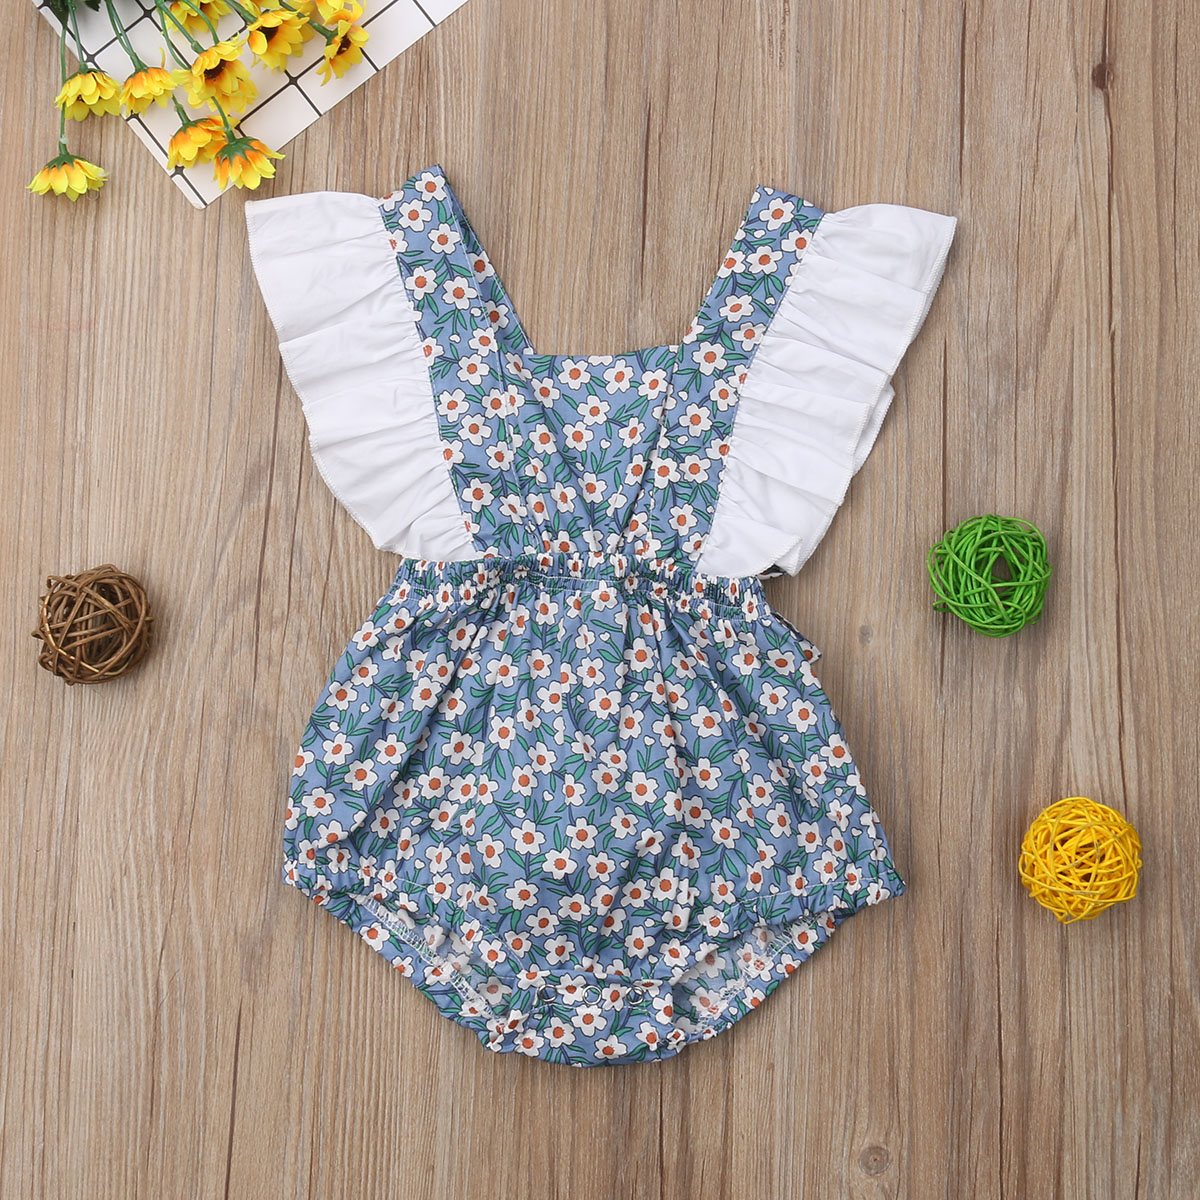 2019 Newborn Baby Girl Floral Ruffle Bodysuit Ruffles Sleeve 3 Colors Cute Jumpsuit Outfit Sunsuit 0-24M